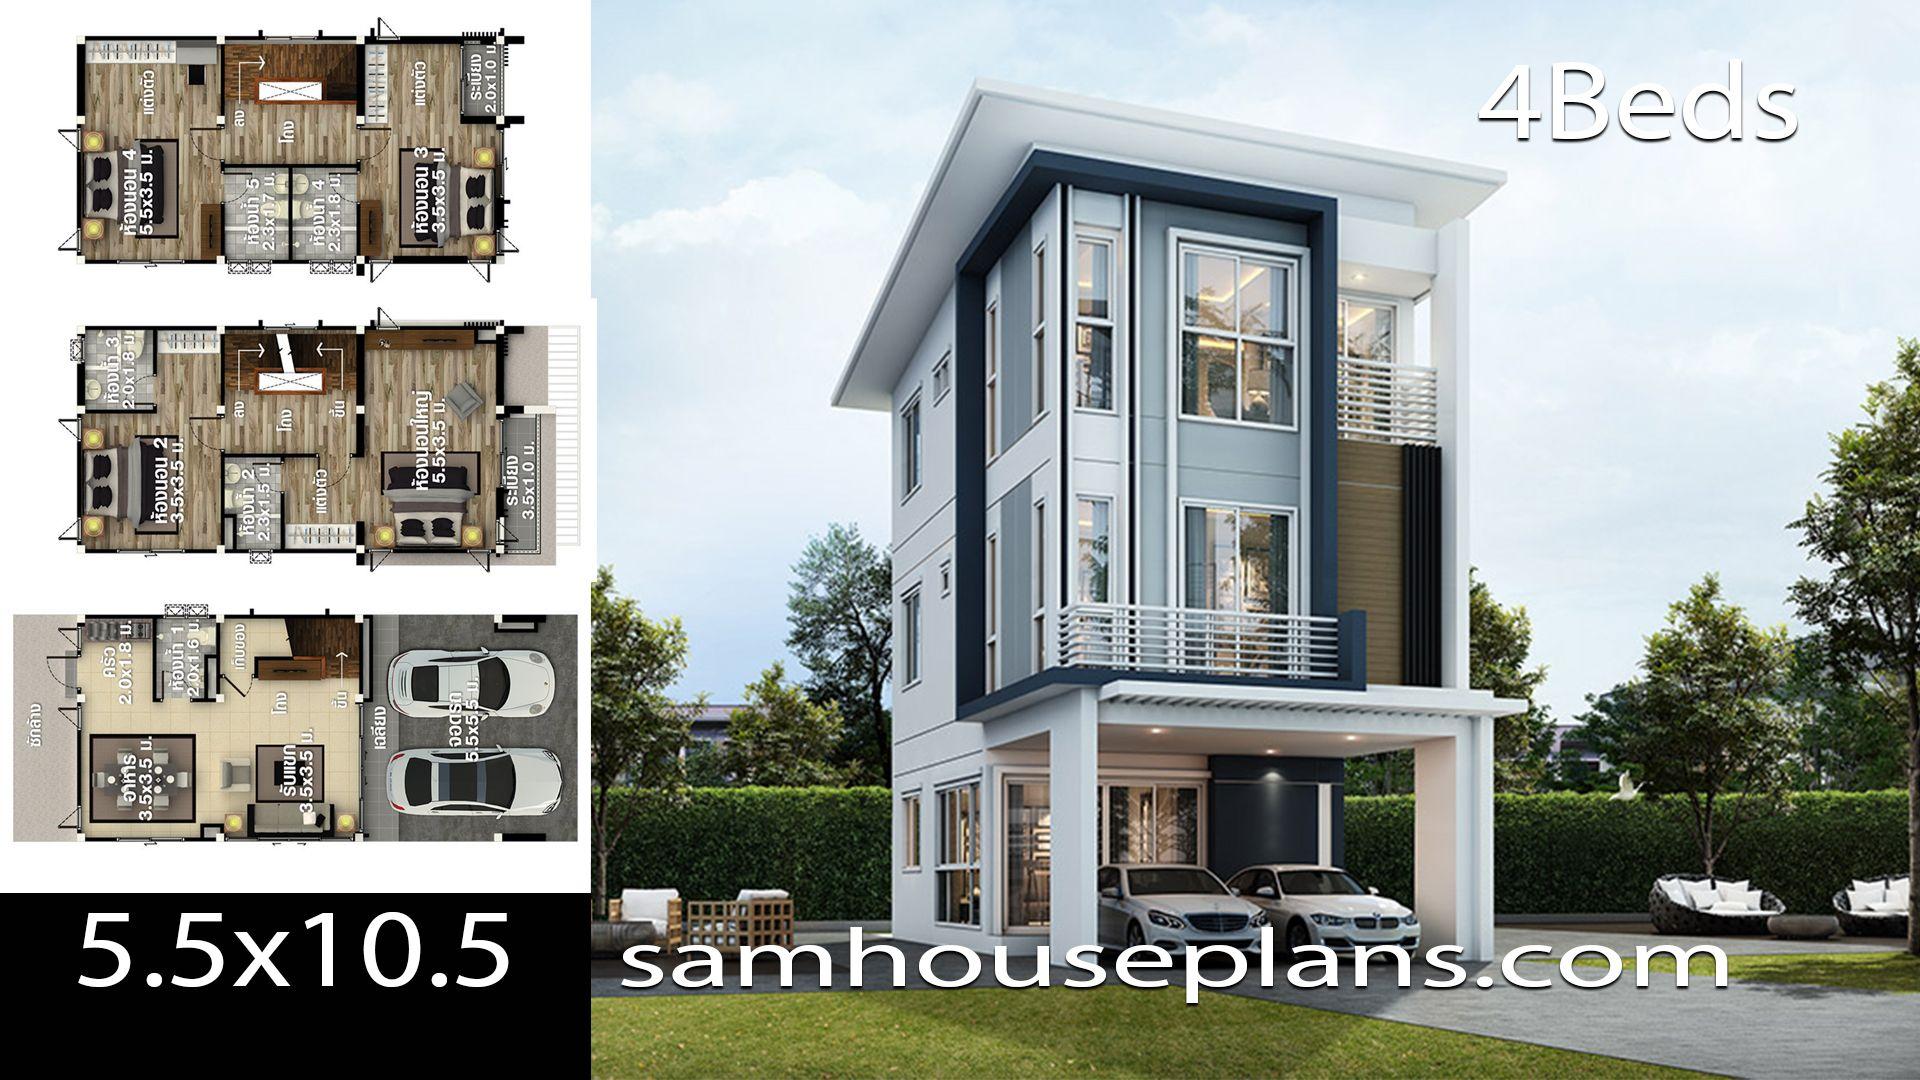 House Plans Idea 5 5x10 5 With 4 Bedroomsthe House Has Building Size M X M 5 50 X 10 50land Size Model House Plan House Layout Plans Bungalow House Design